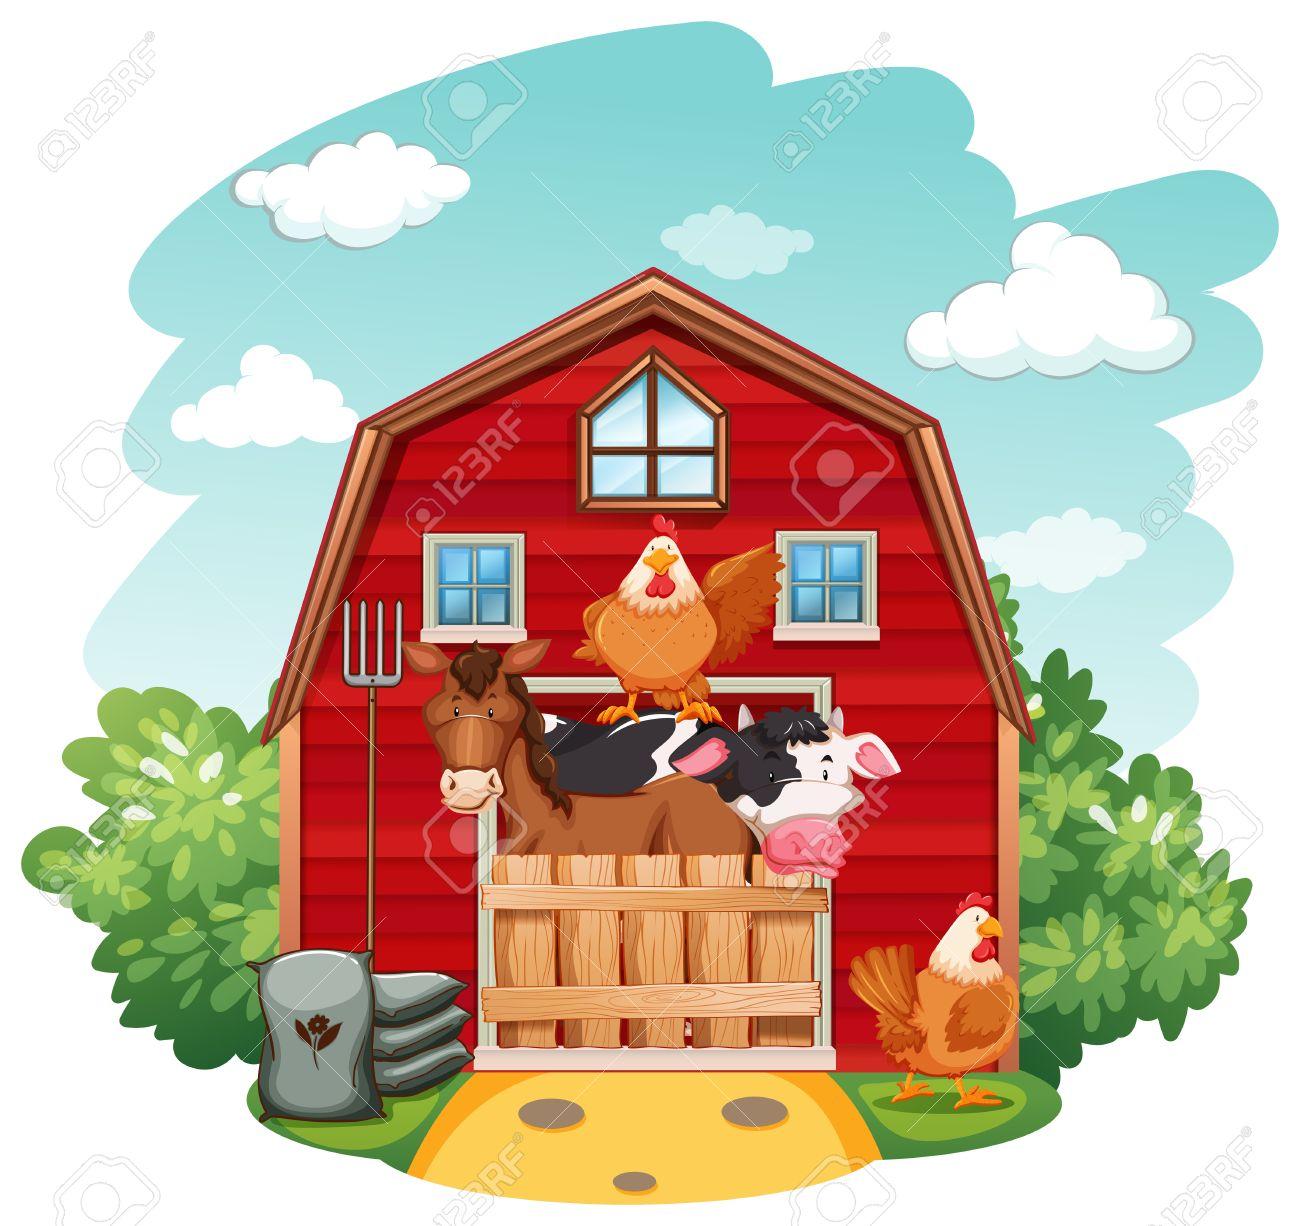 Farm animals in the barn.